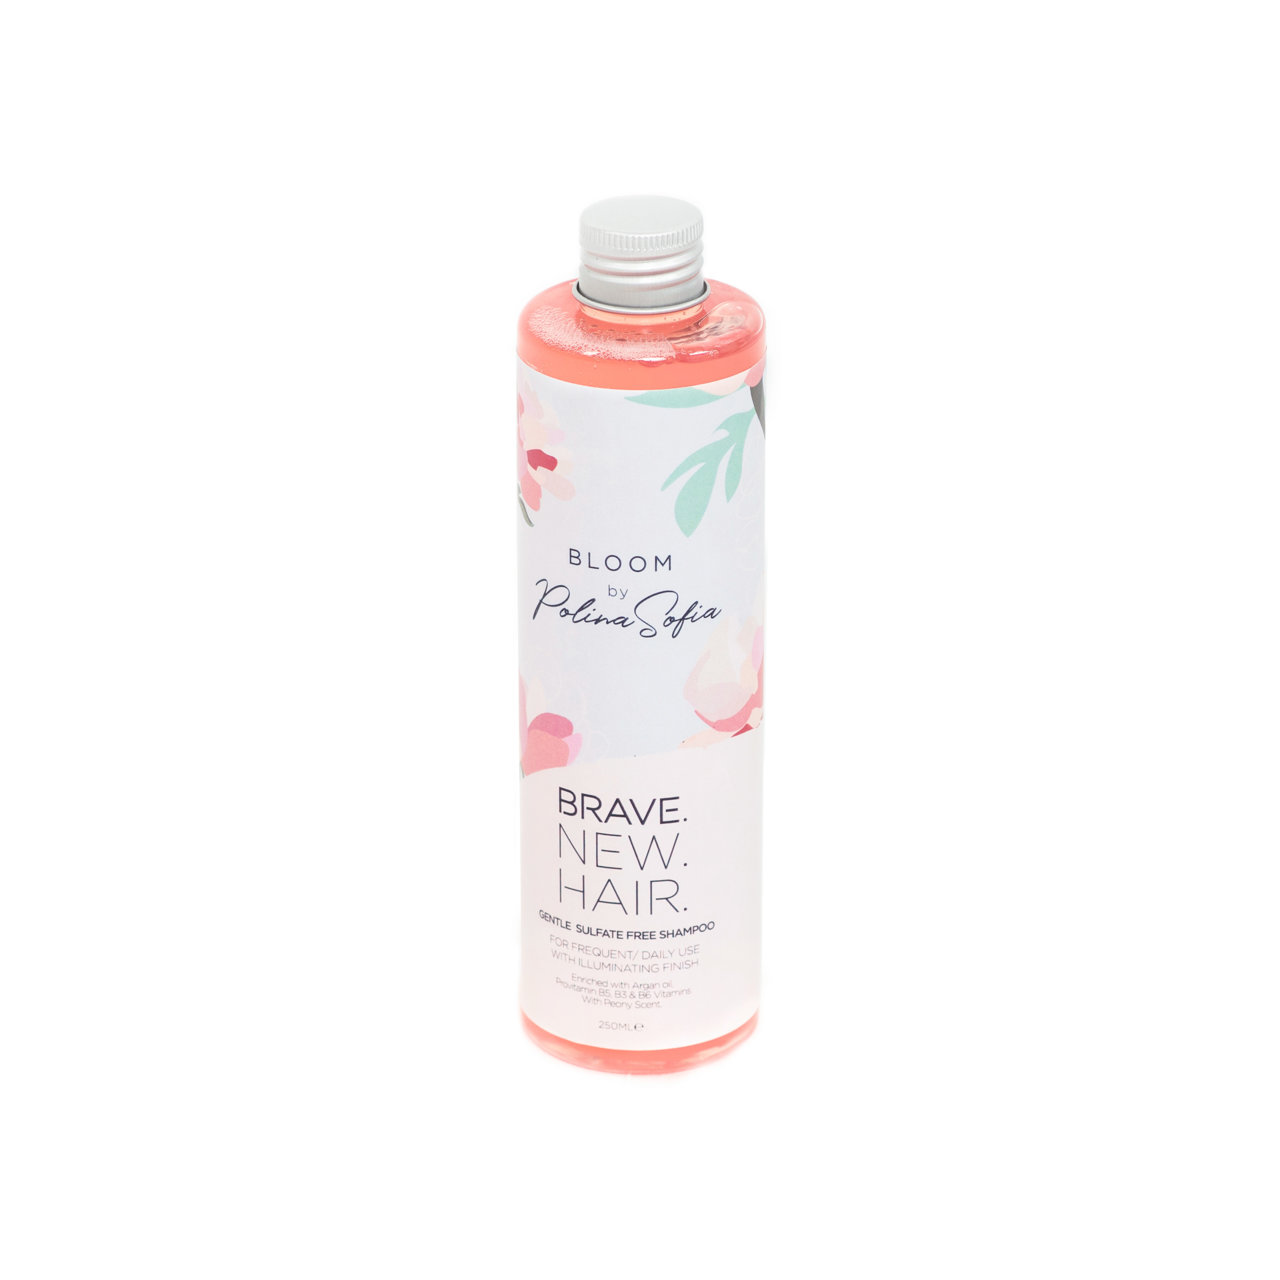 Bloom Shampoo Draft